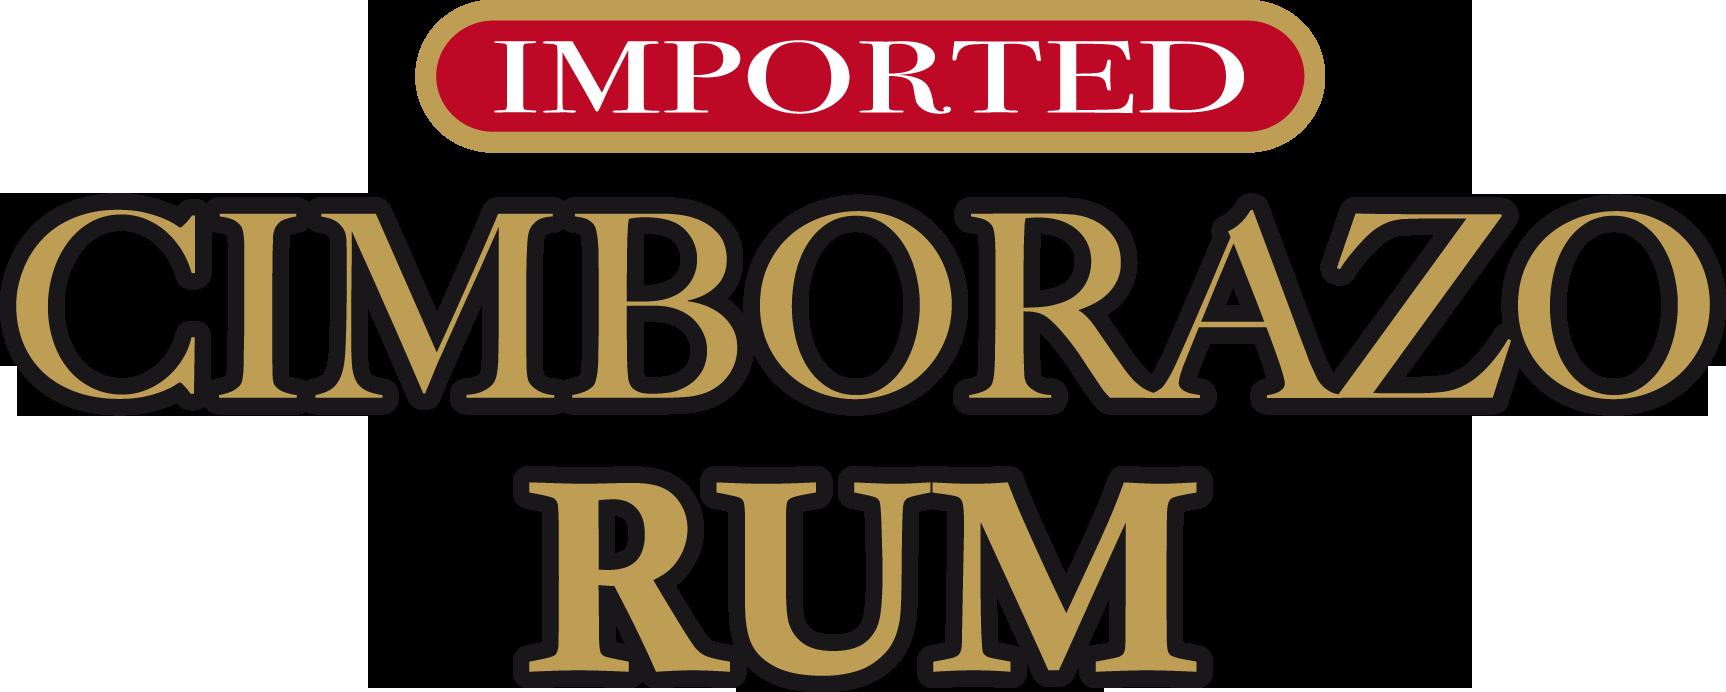 CIMBORAZO logo